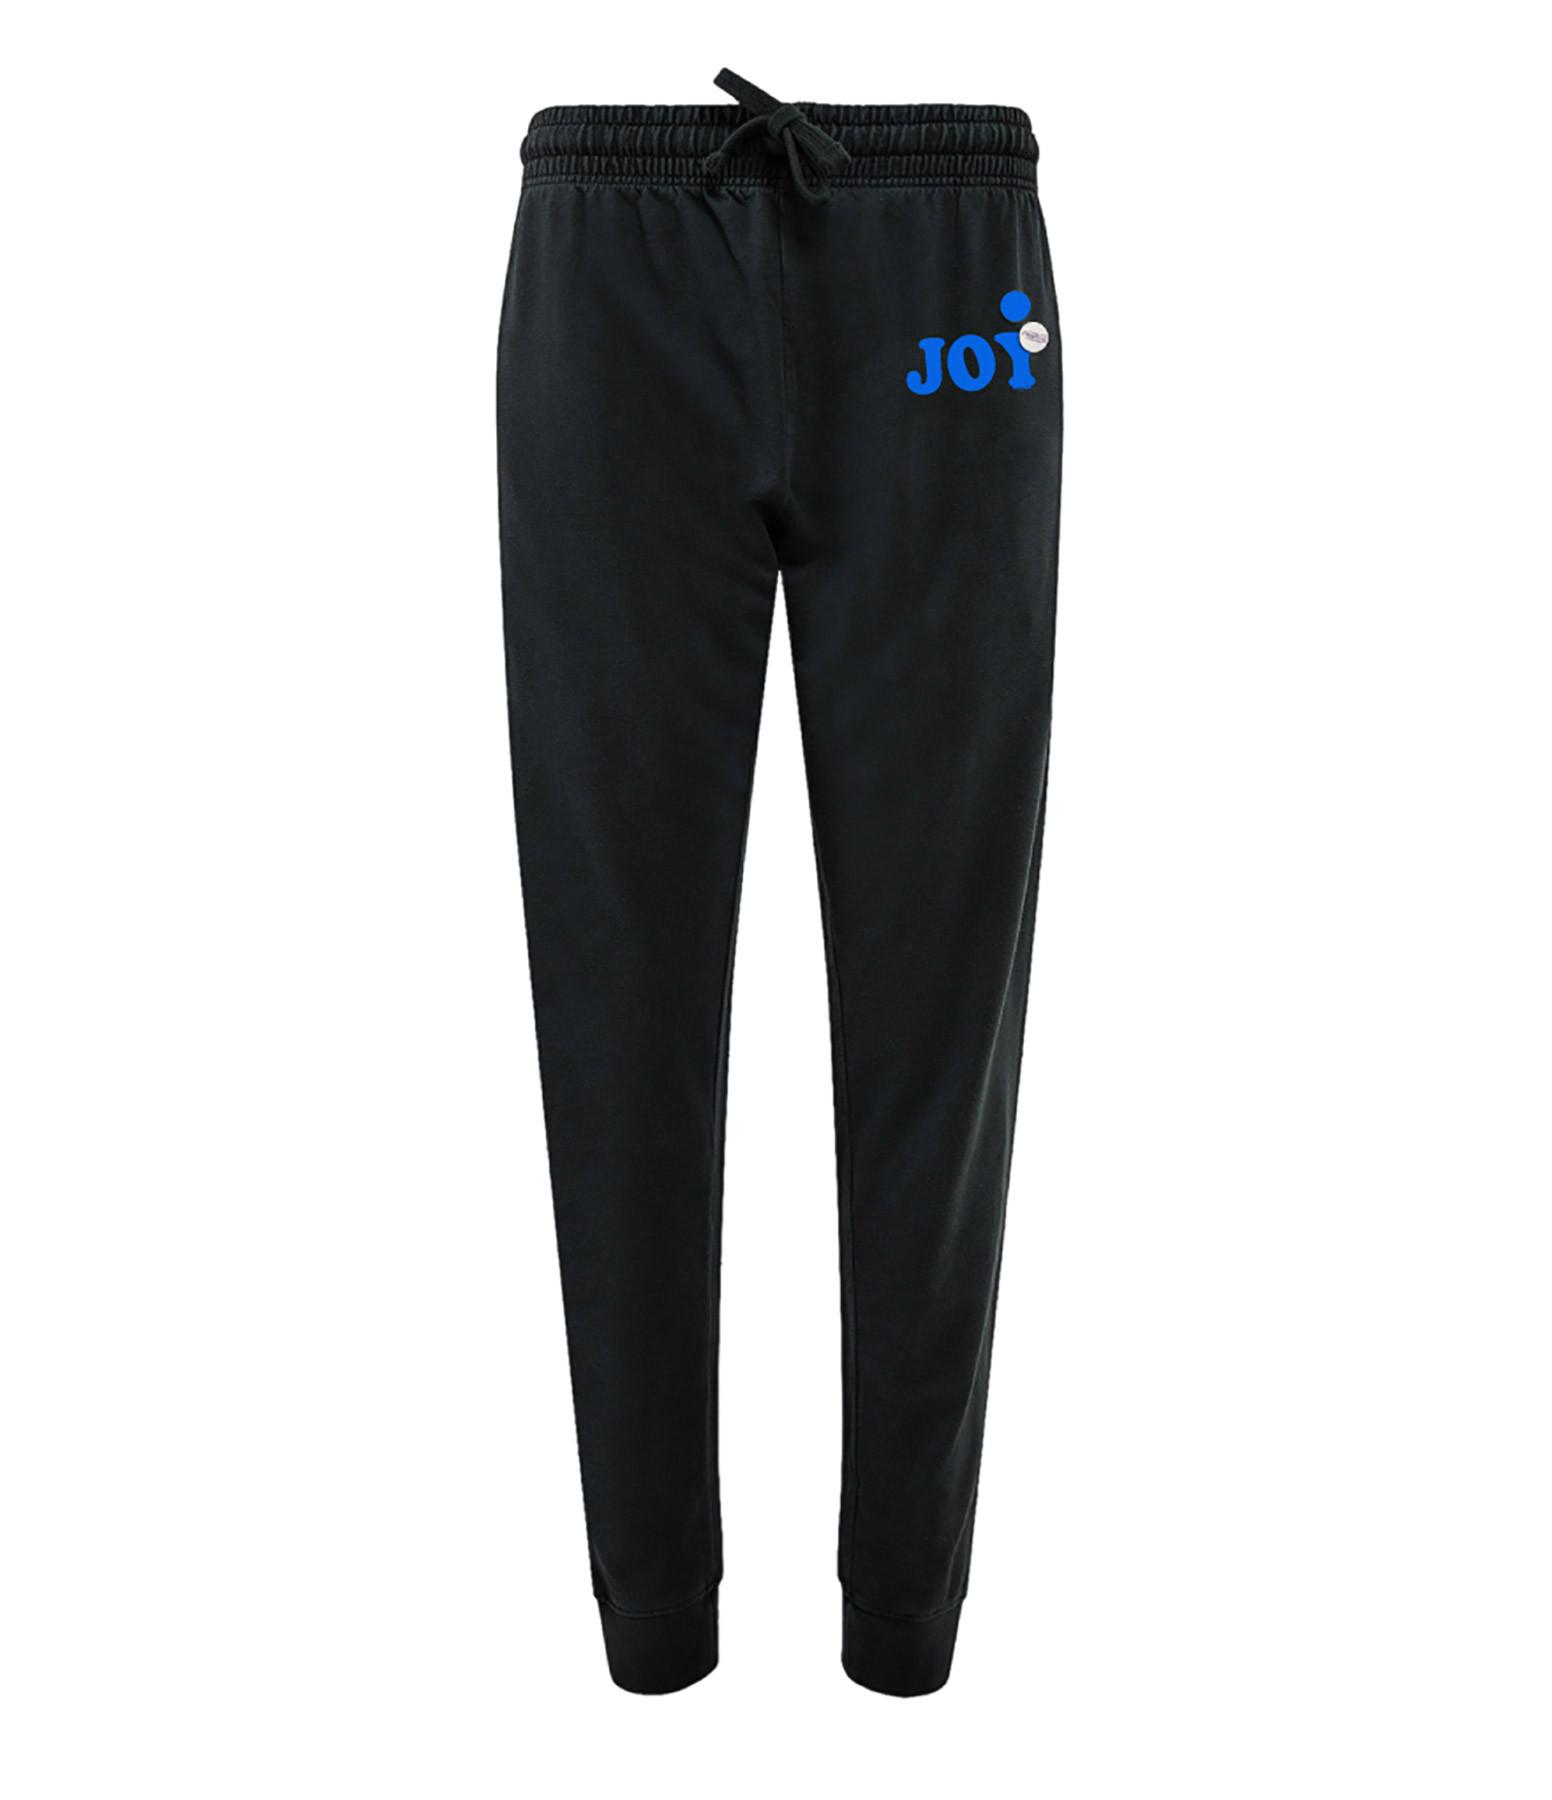 NEWTONE - Jogging Joy Coton Noir